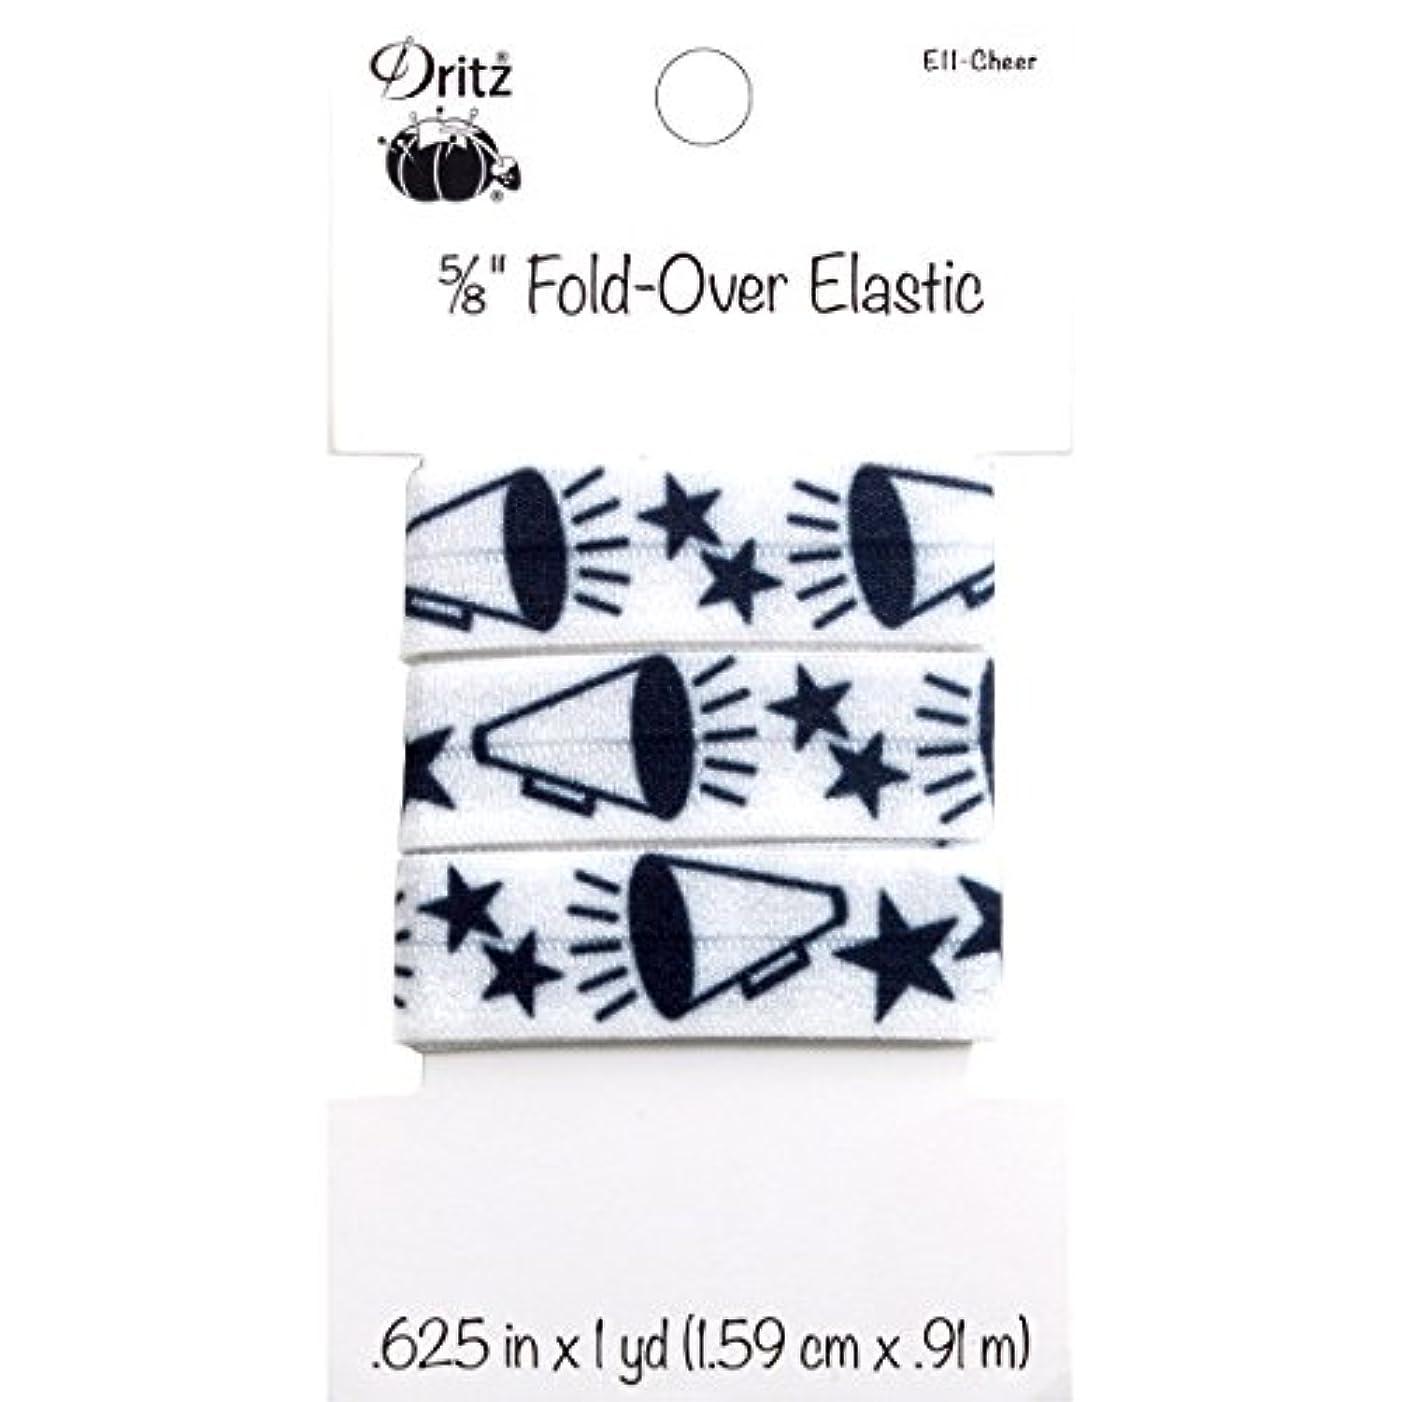 Dritz Fold-Over Elastic Sports Motifs, 5/8 by 1 yd, Cheer